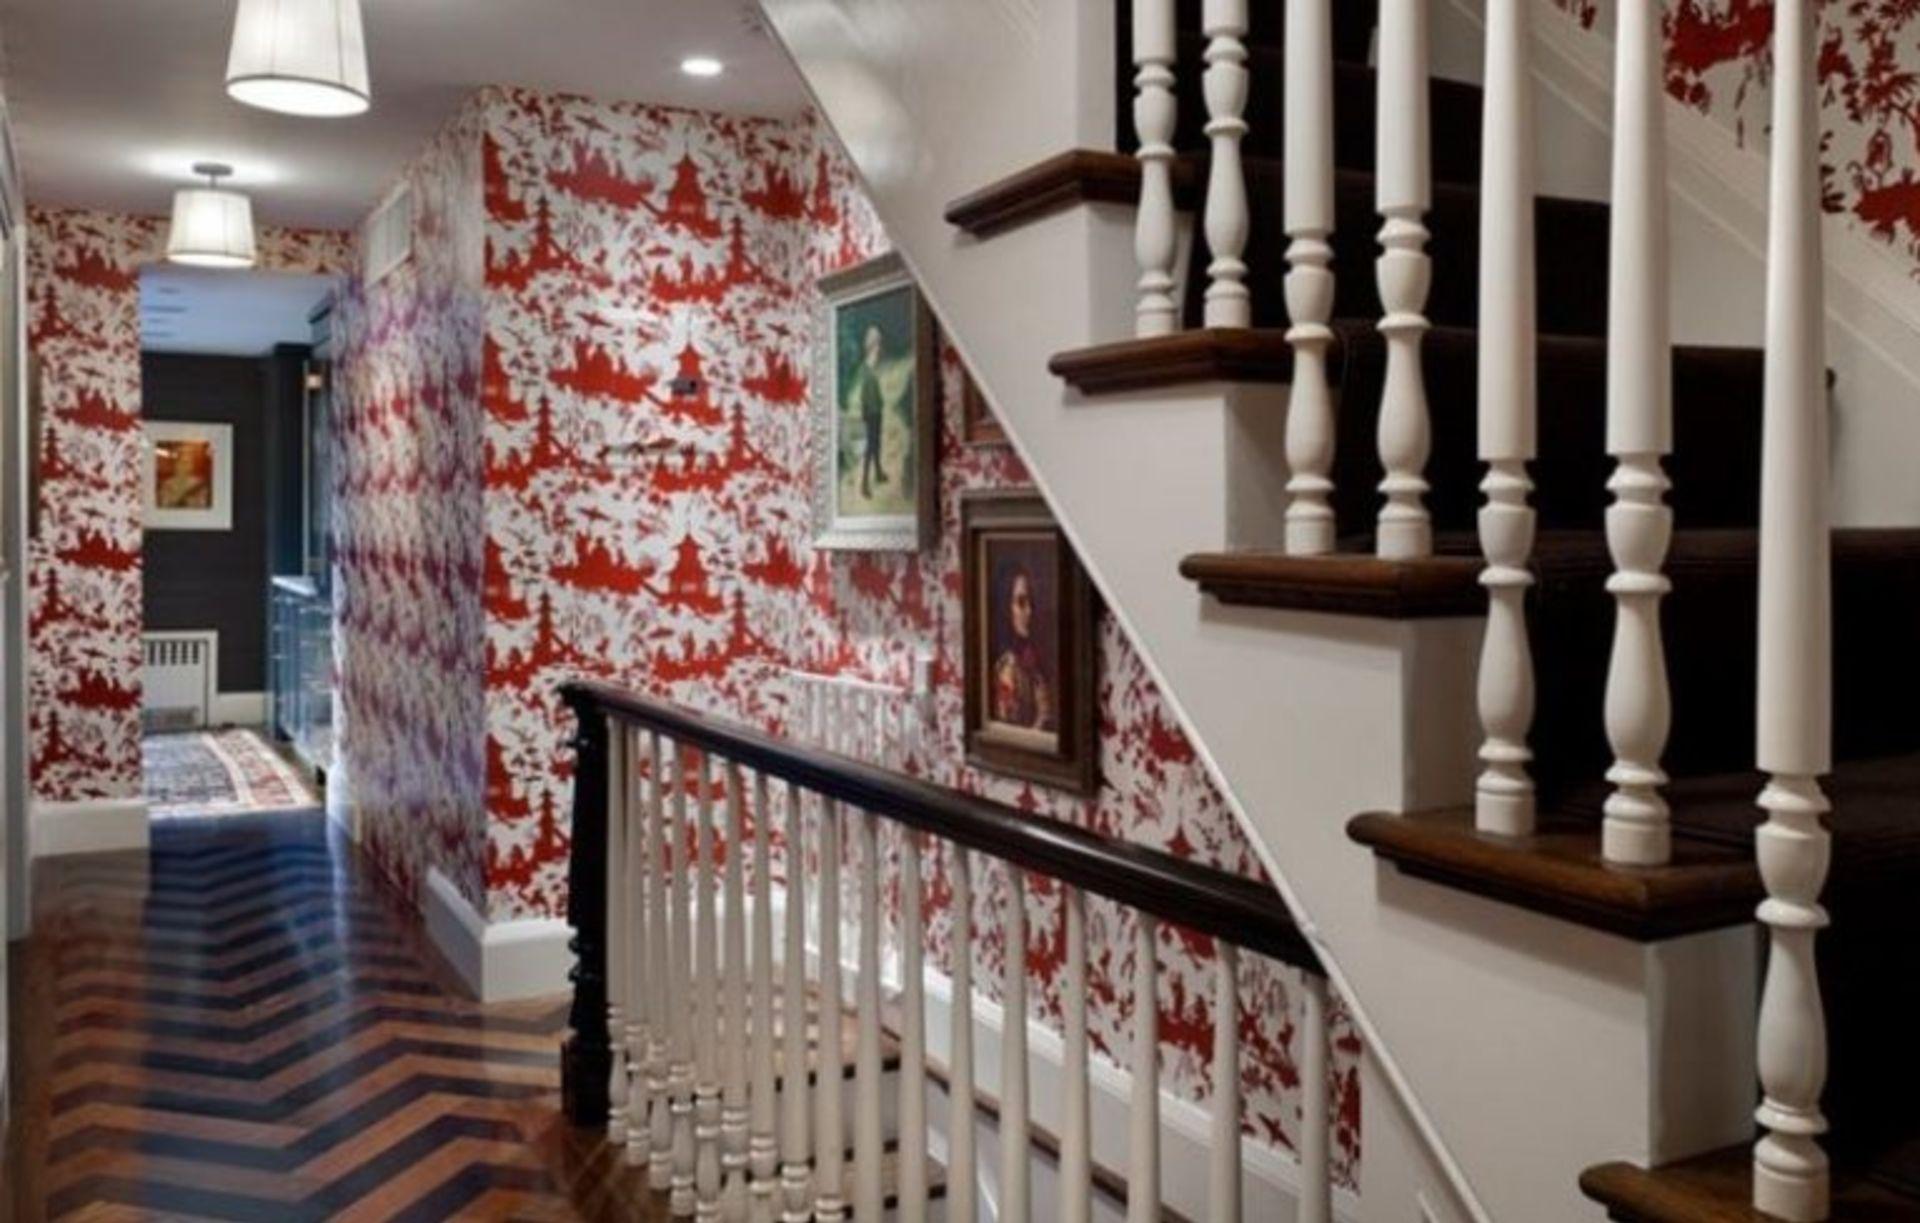 12 Beautiful Rooms That Will Make You Love Wallpaper Again!